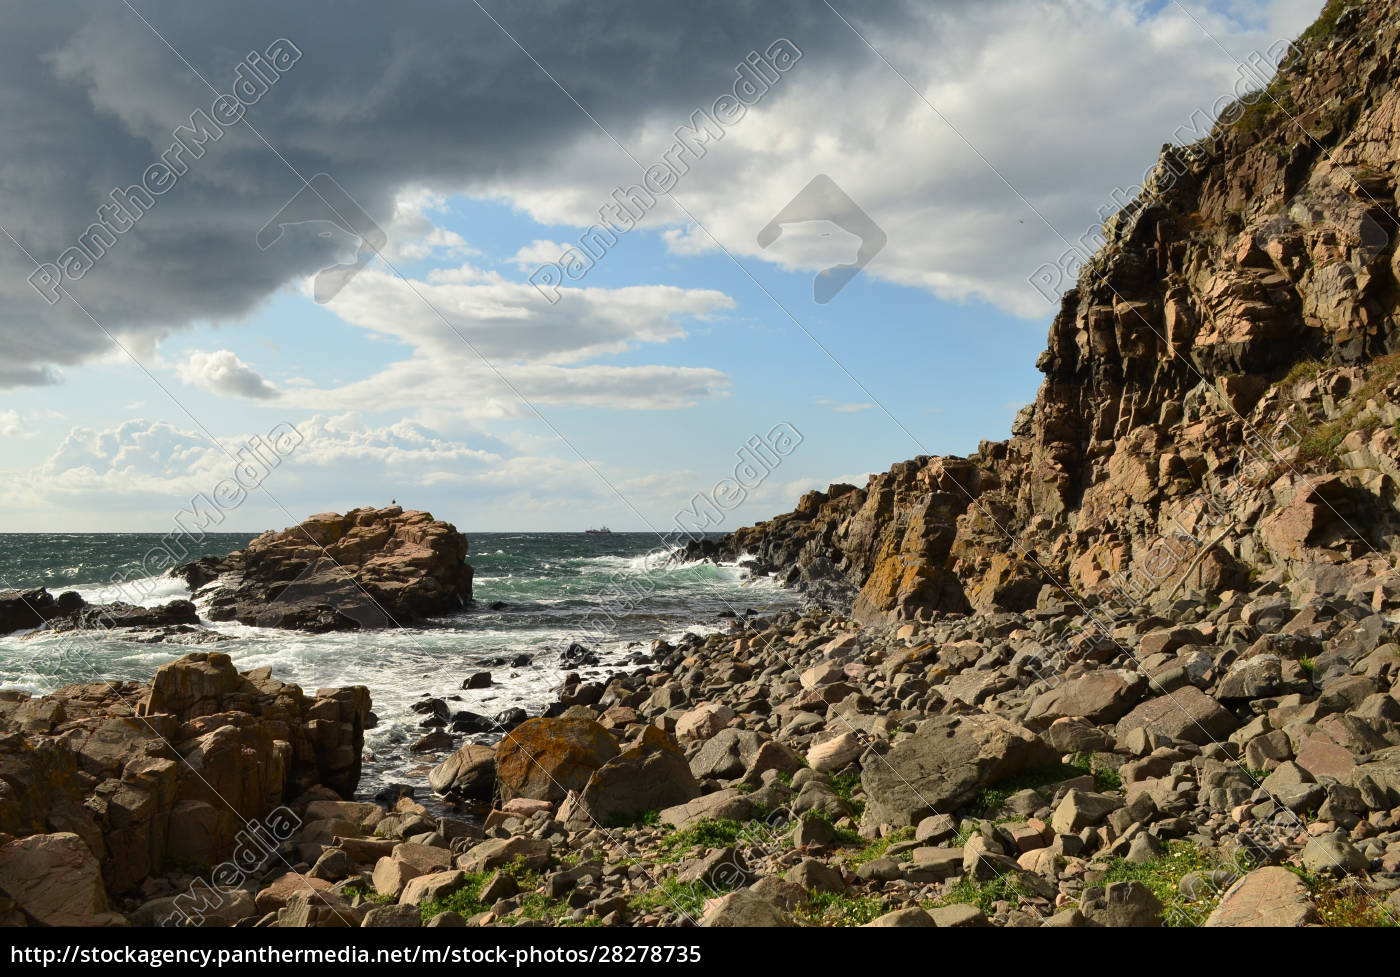 the, rocky, coastline, and, cloudy, sky - 28278735